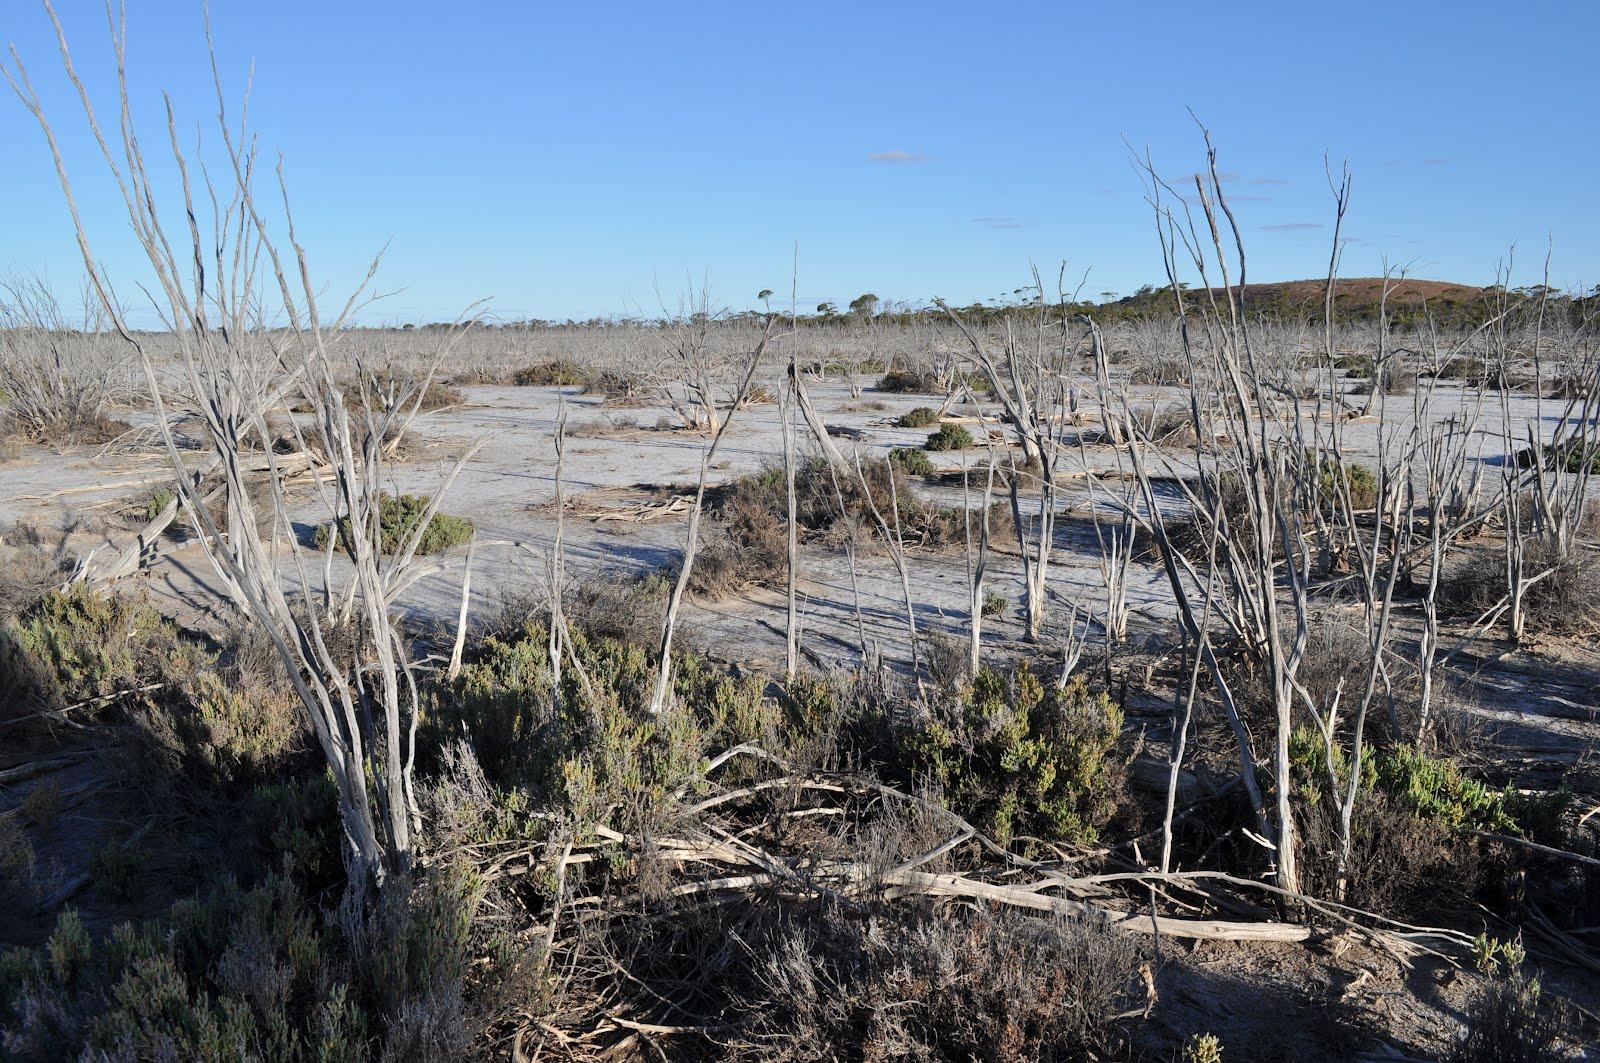 Keep the wheels spinning soil salinity in australia for Soil salinization